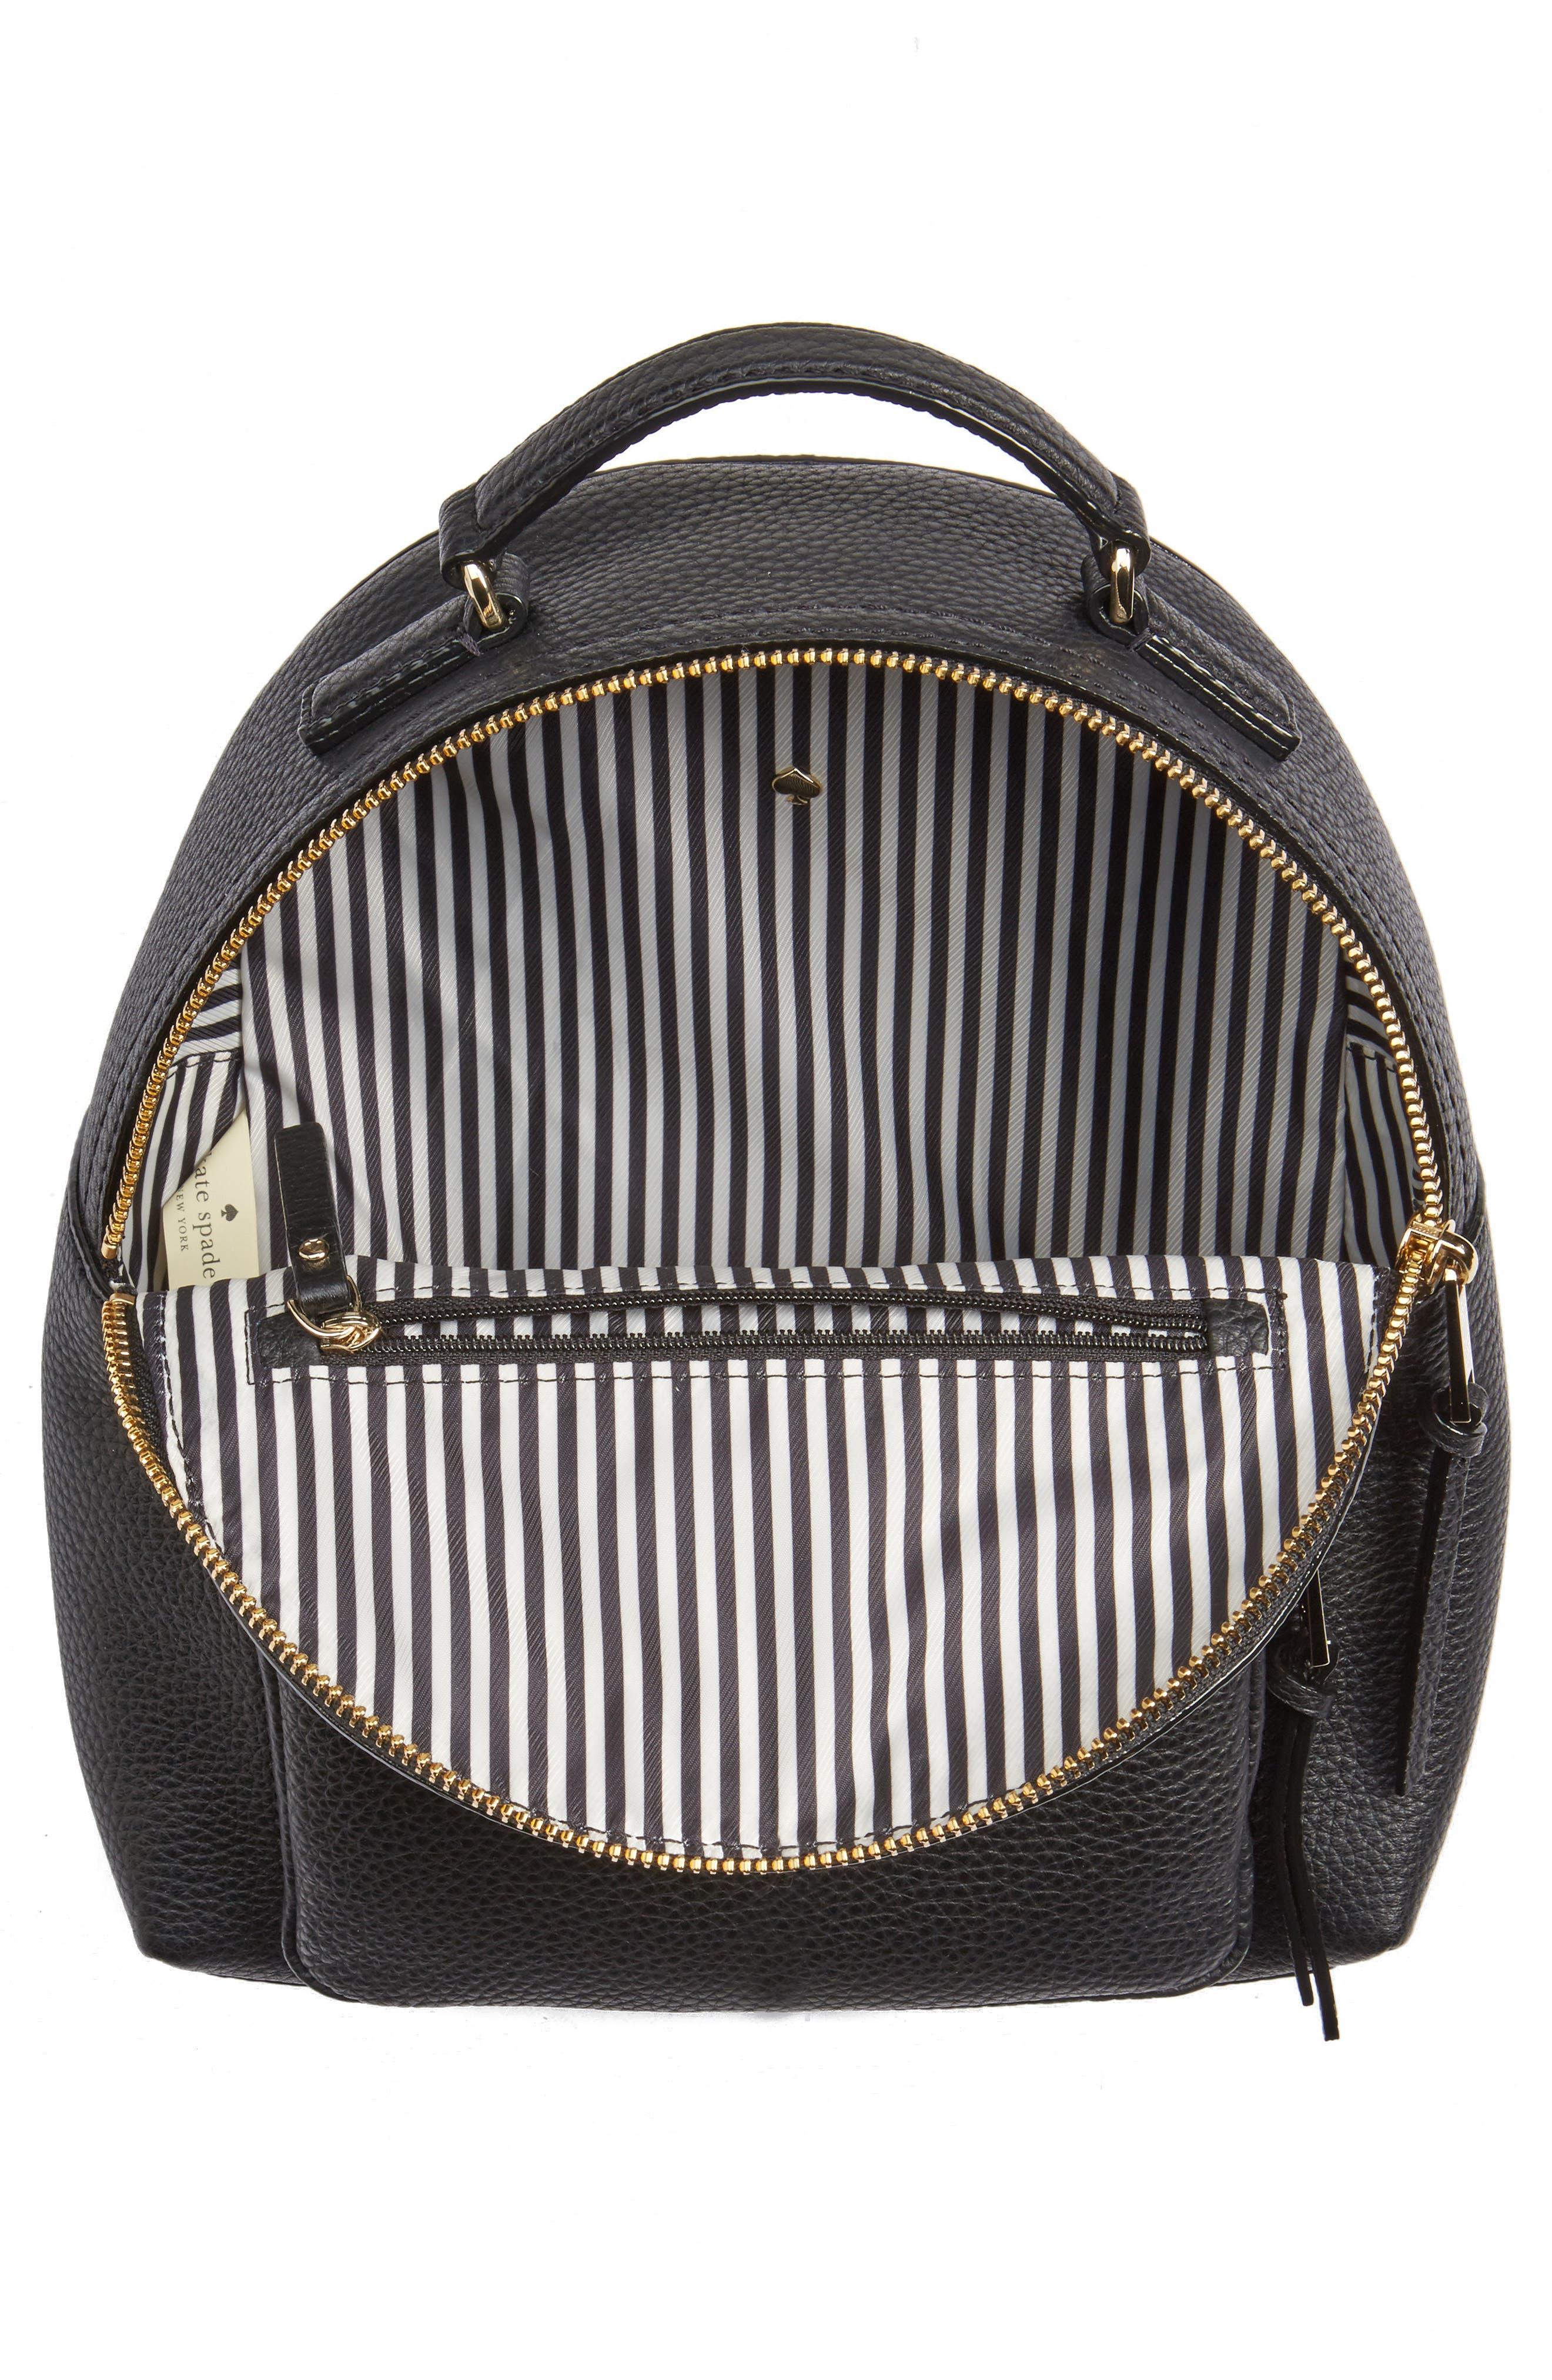 KATE SPADE NEW YORK, jackson street - keleigh leather backpack, Alternate thumbnail 4, color, 001